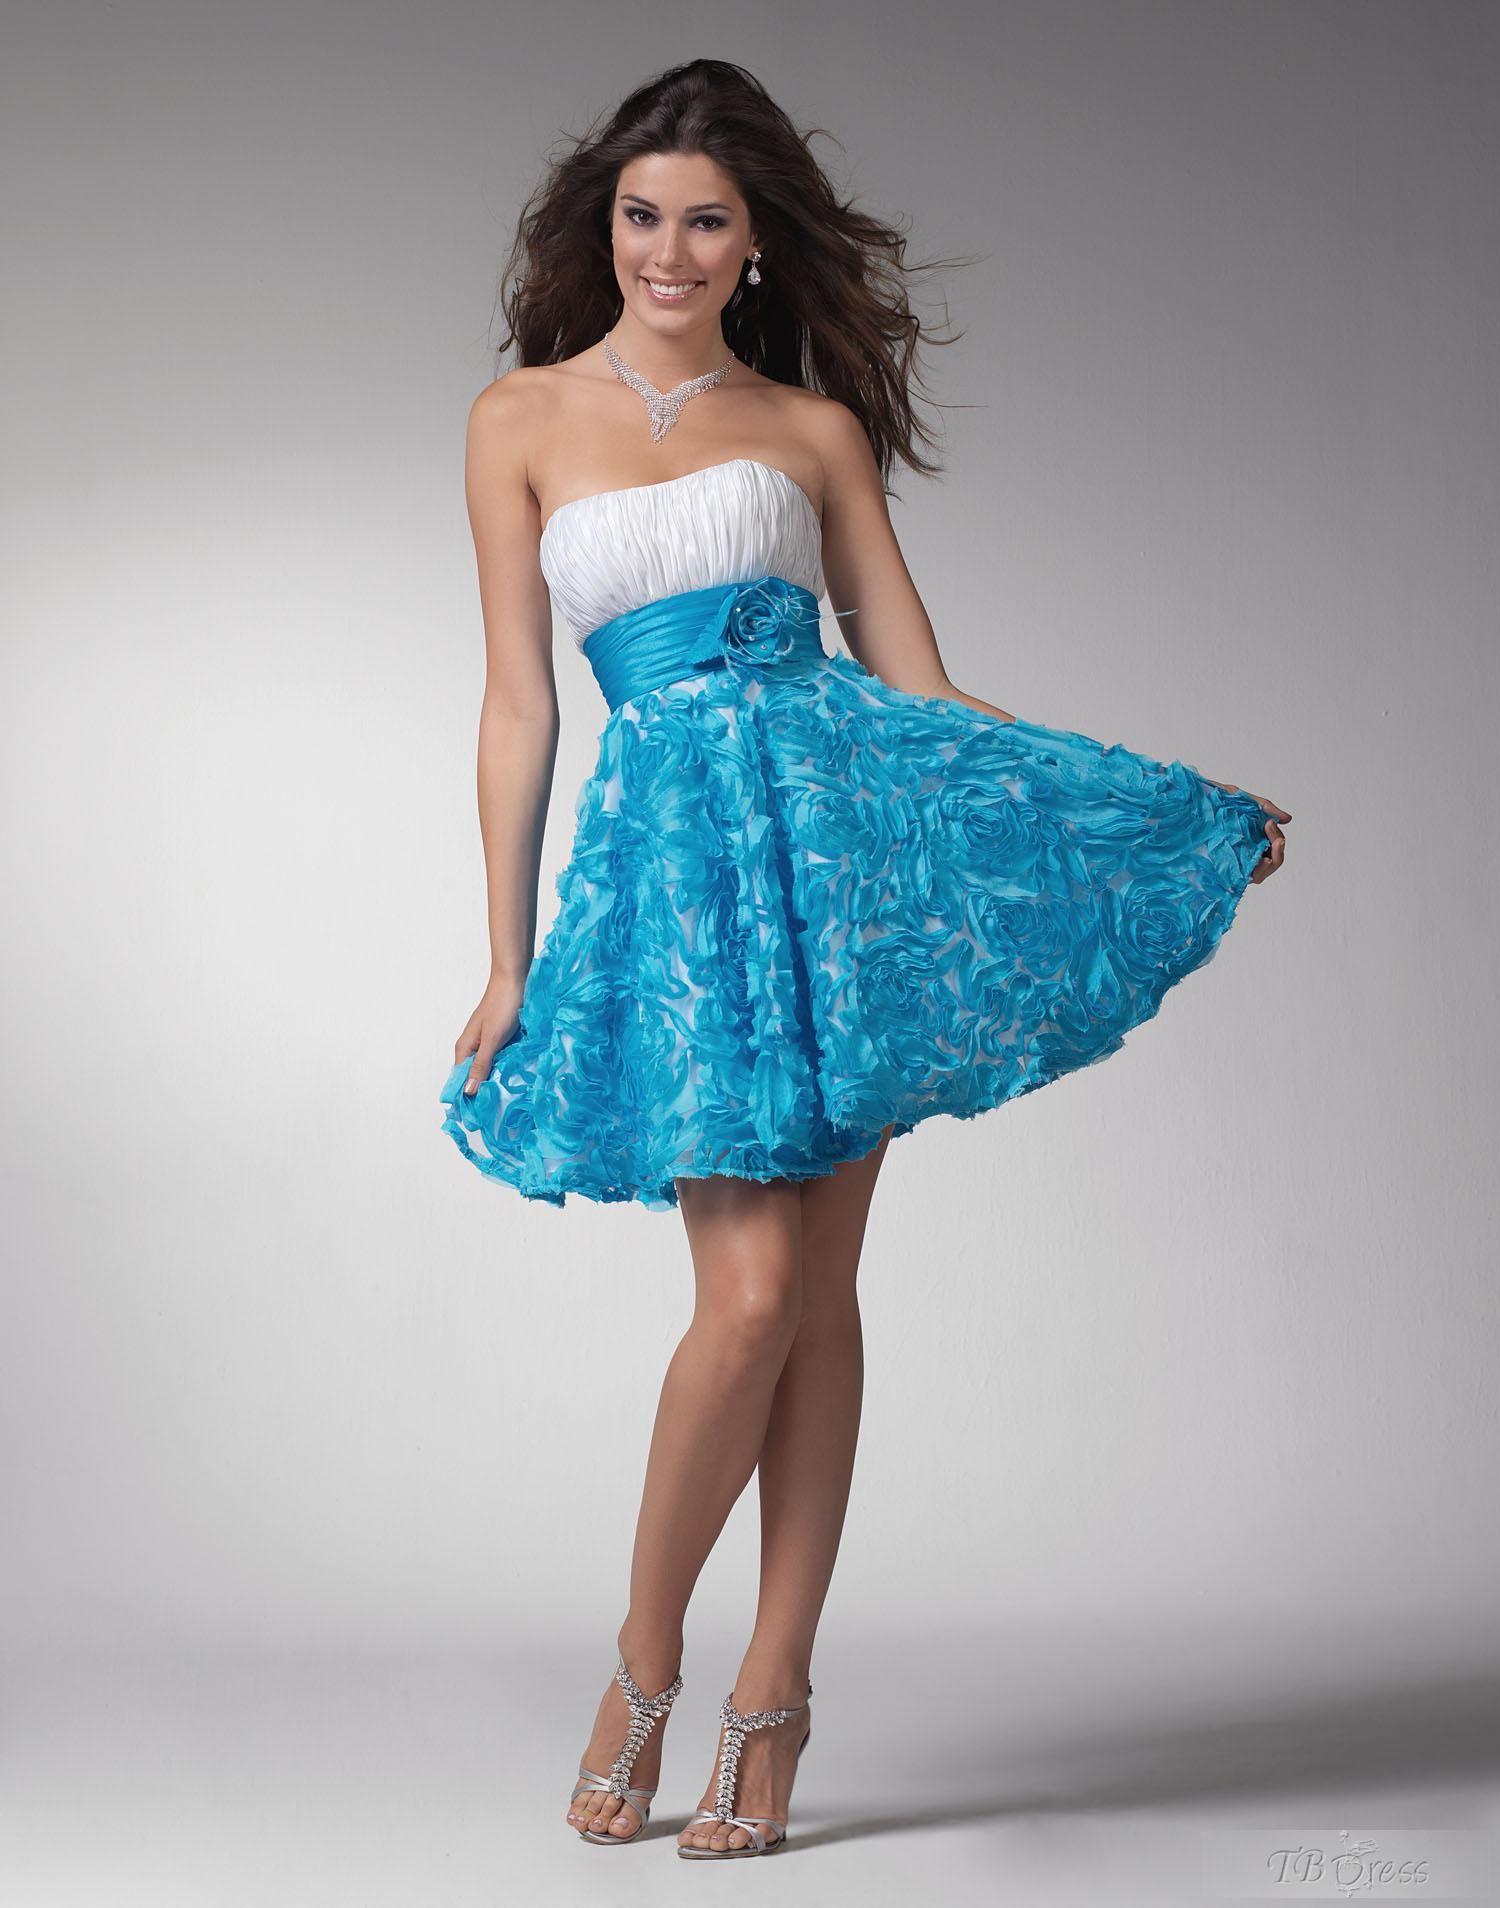 Dressesforteens junior dresses party eveningdiscount